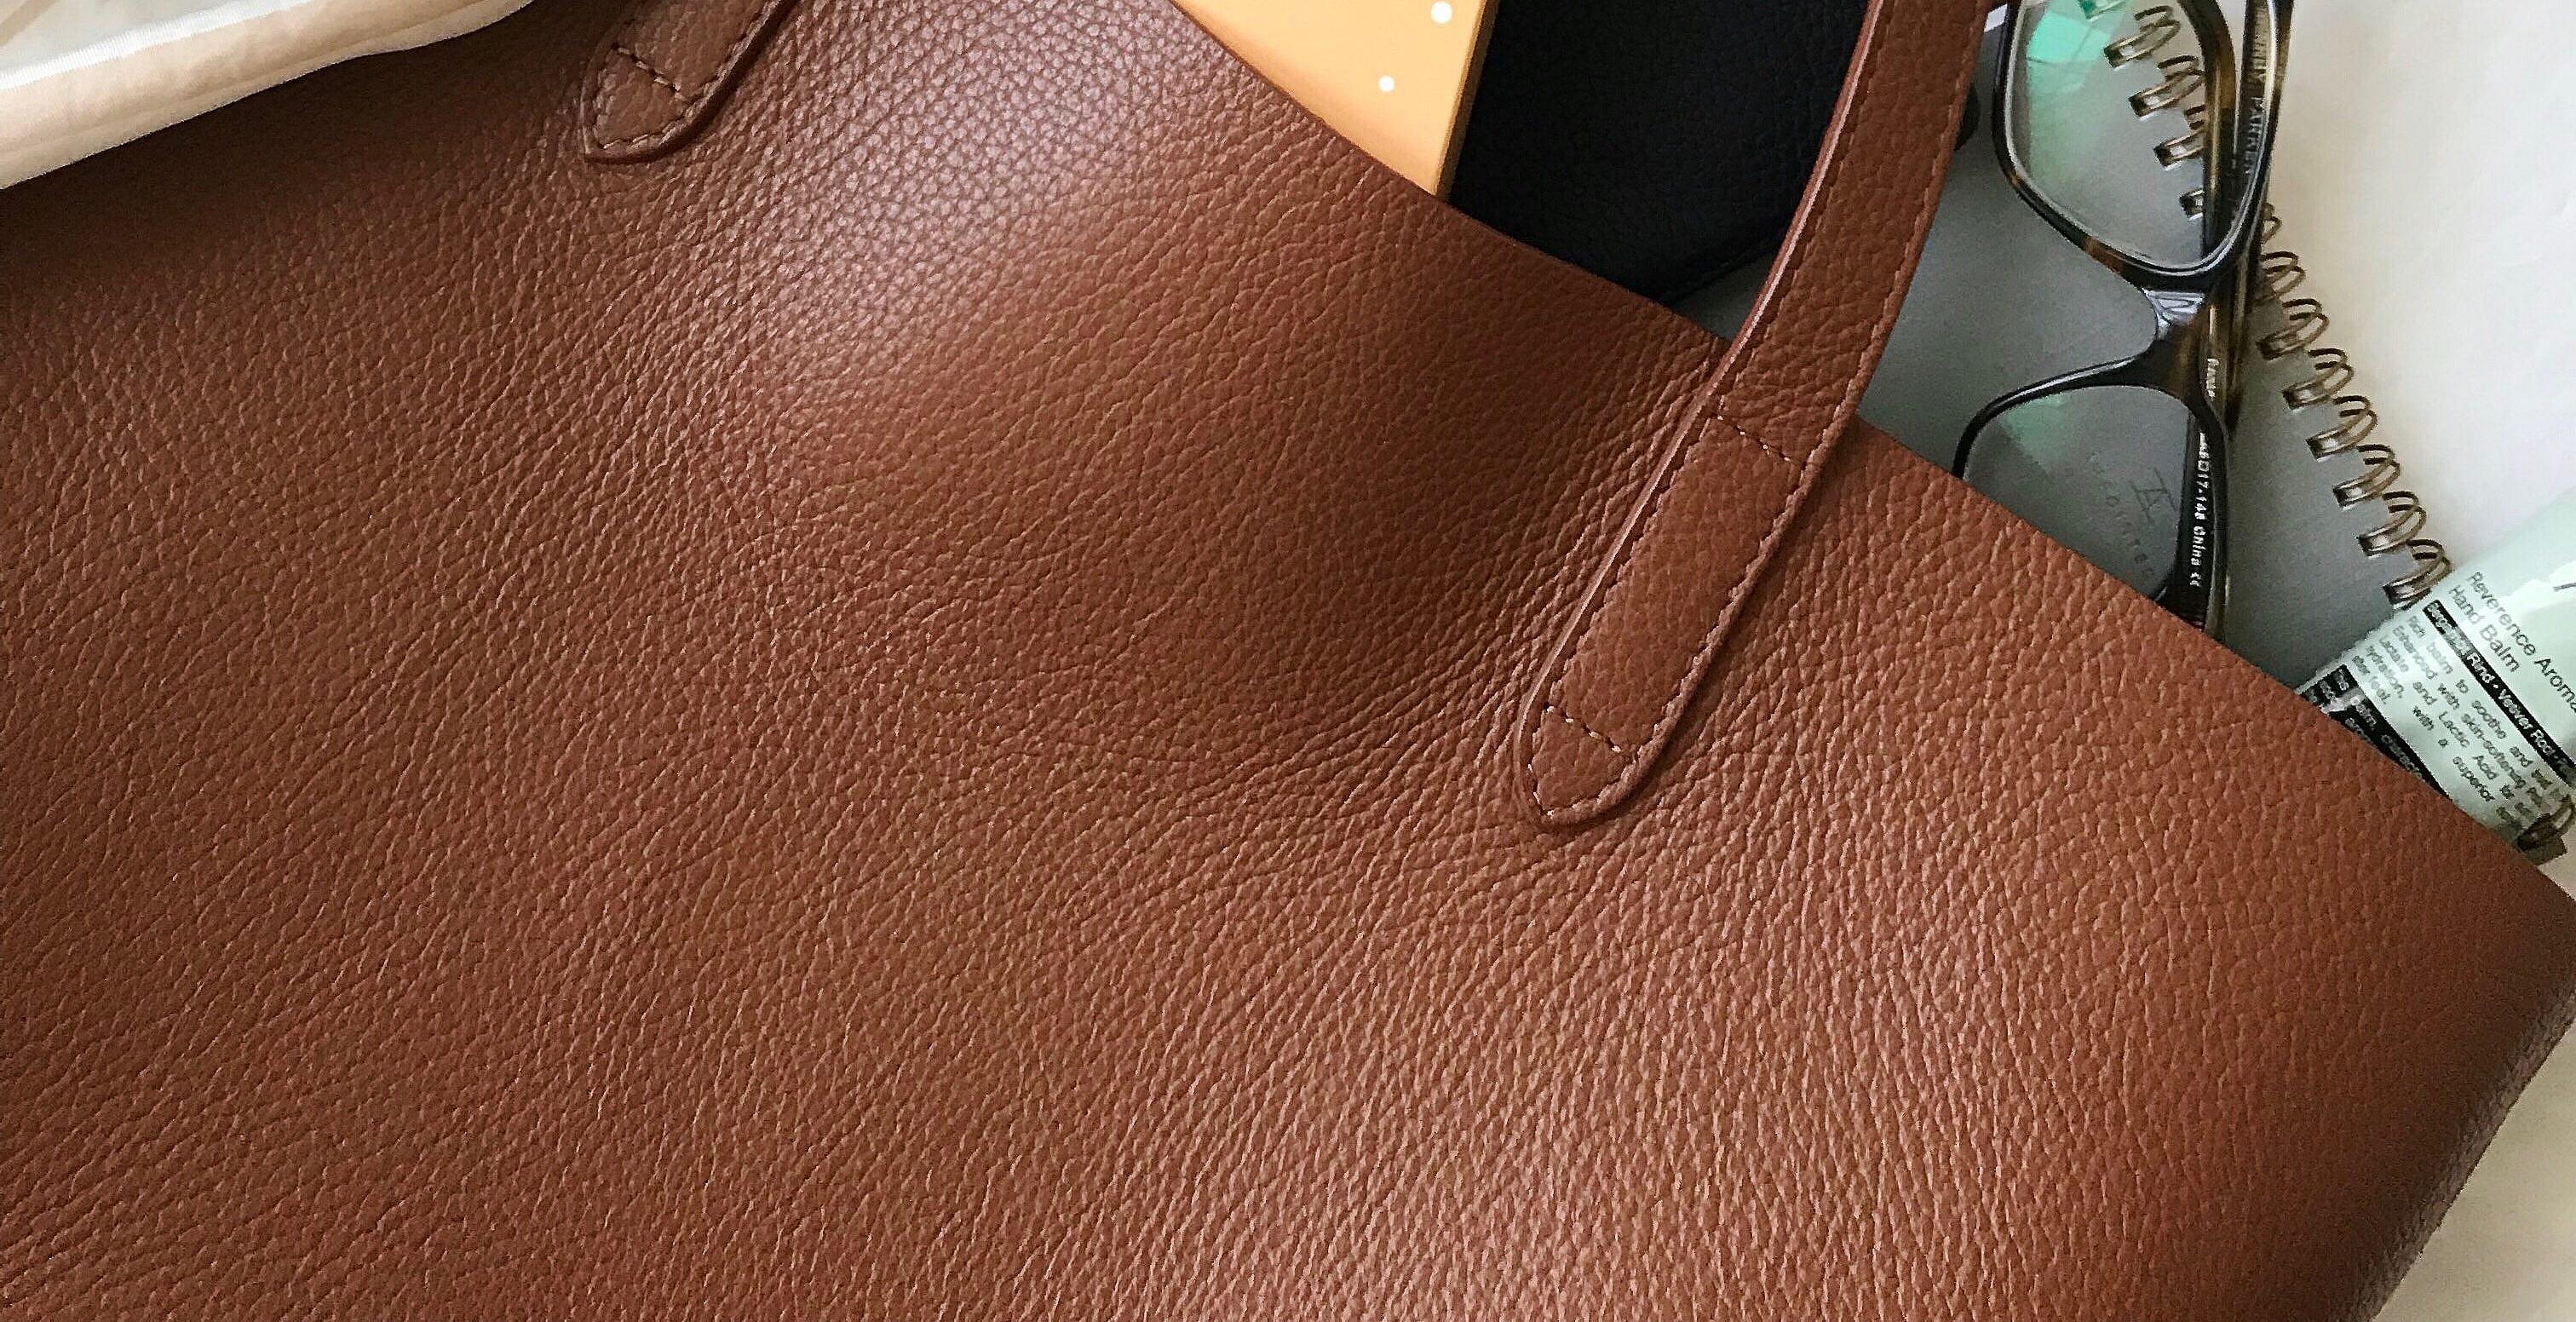 Mulberry's sustainable handbag